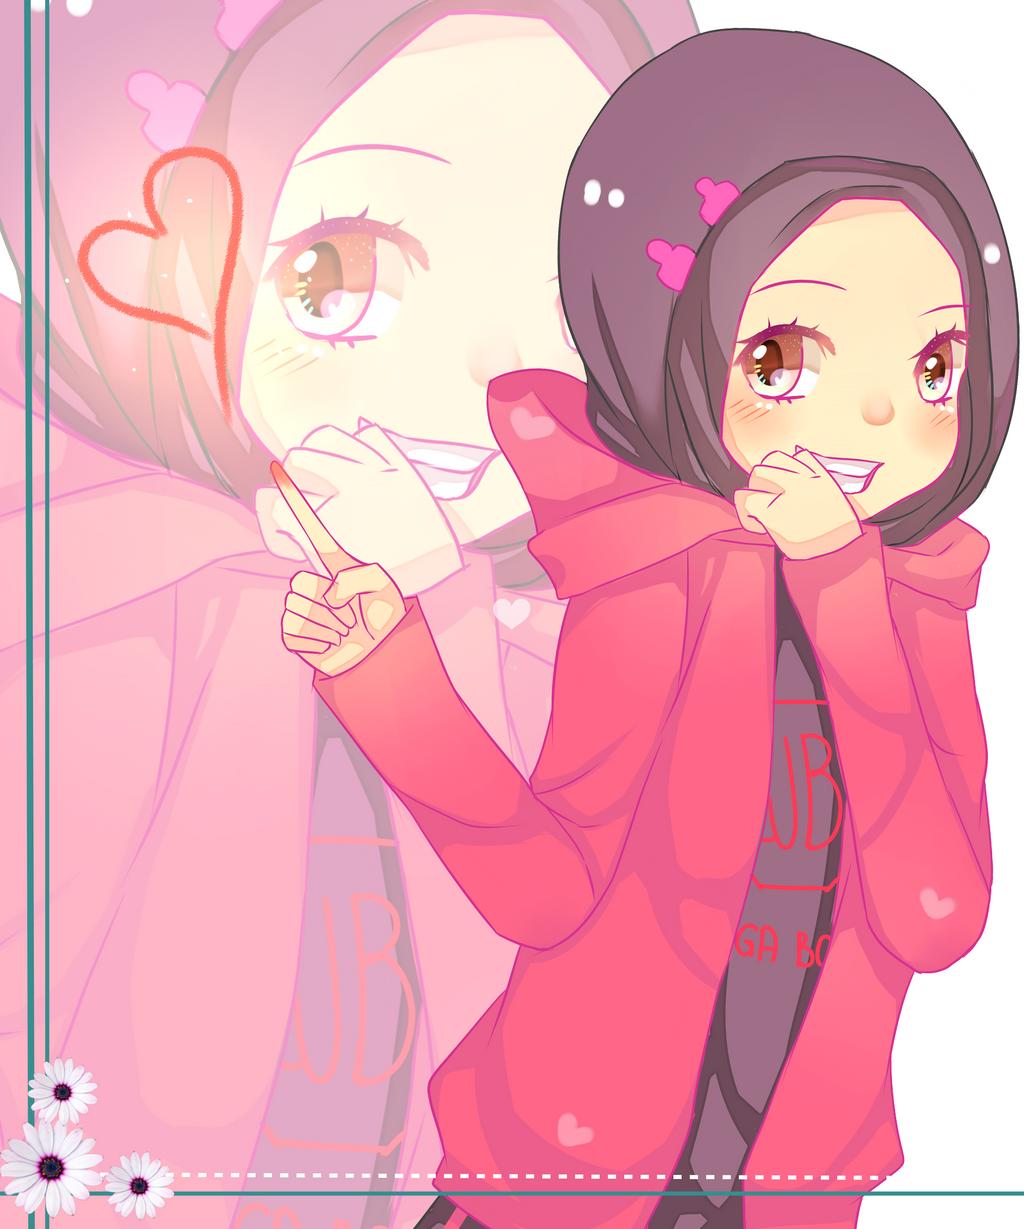 Muslim manga contest AT: OC Tika by Naomi-ness on DeviantArt